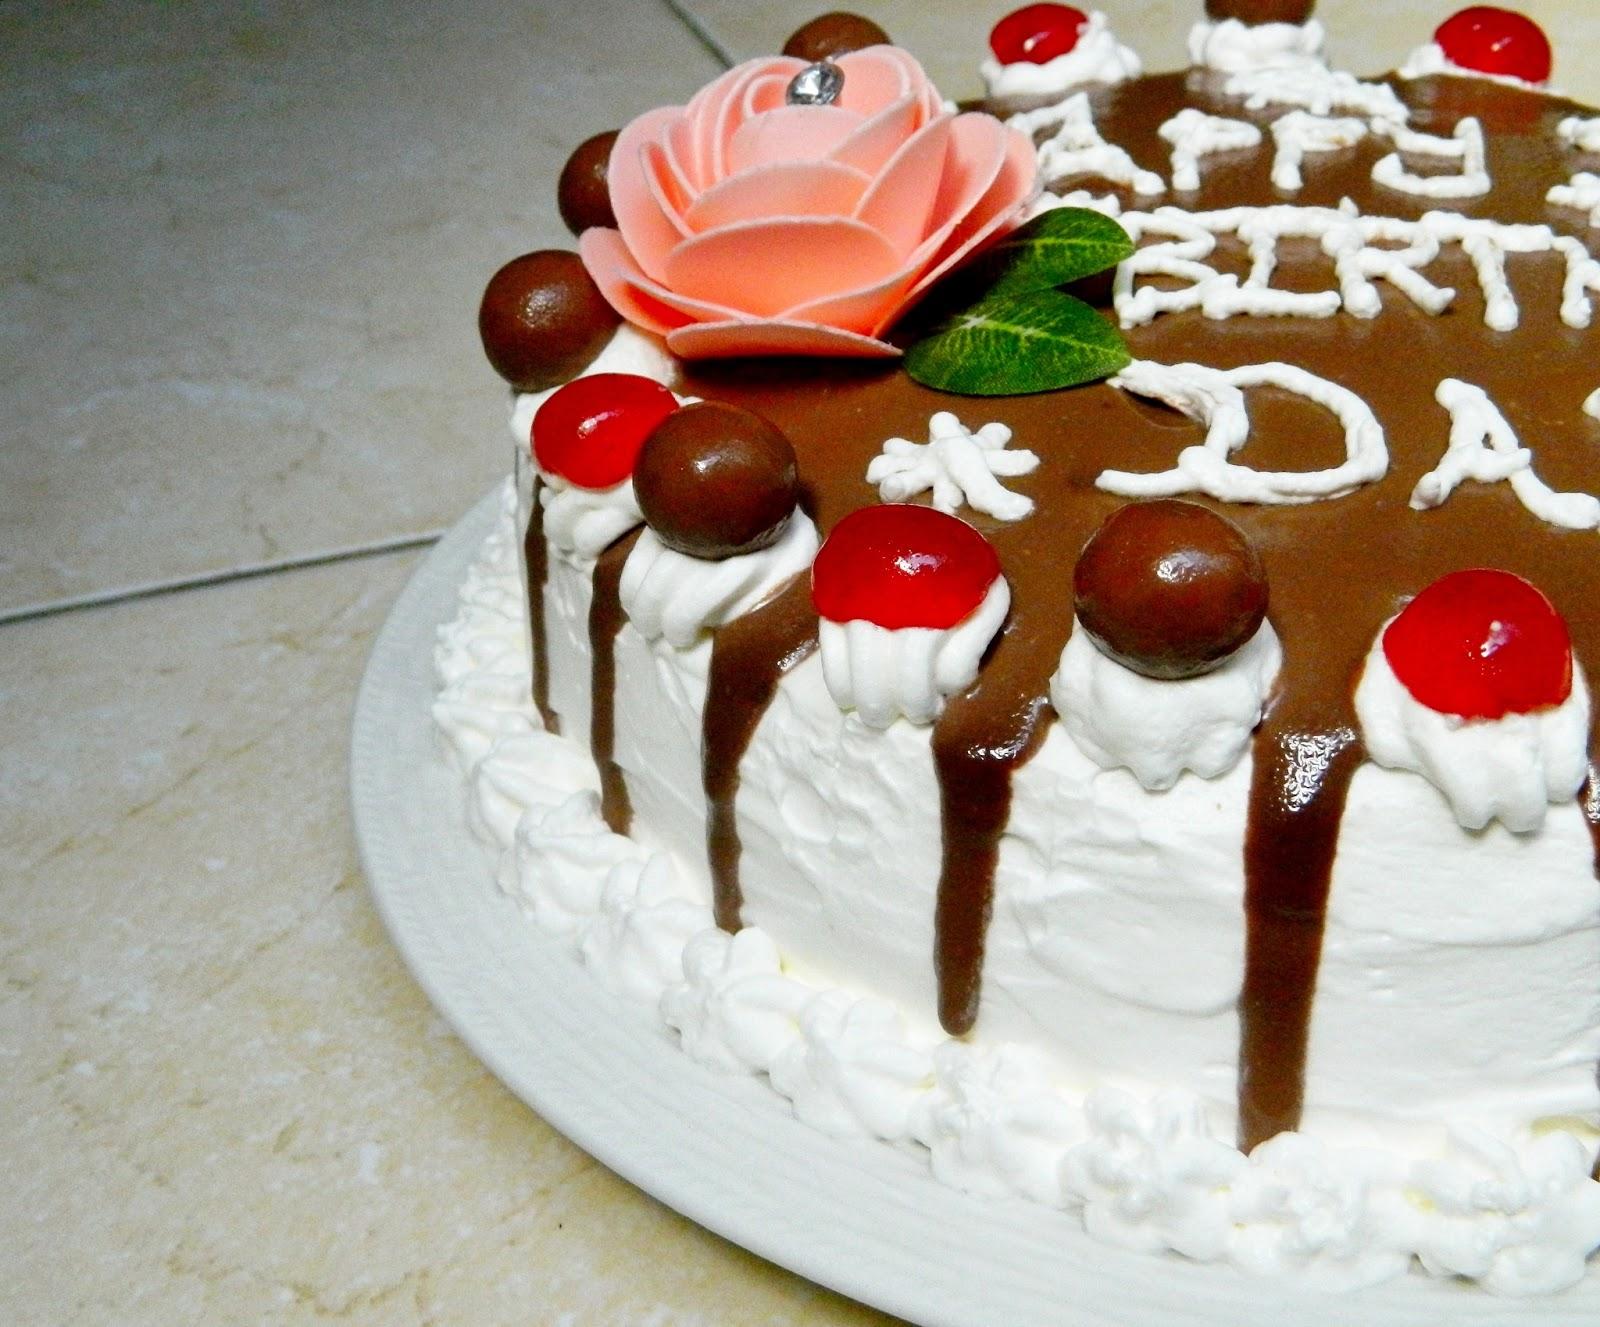 Shadow Cake My Way Confessions Of A Foodaholic